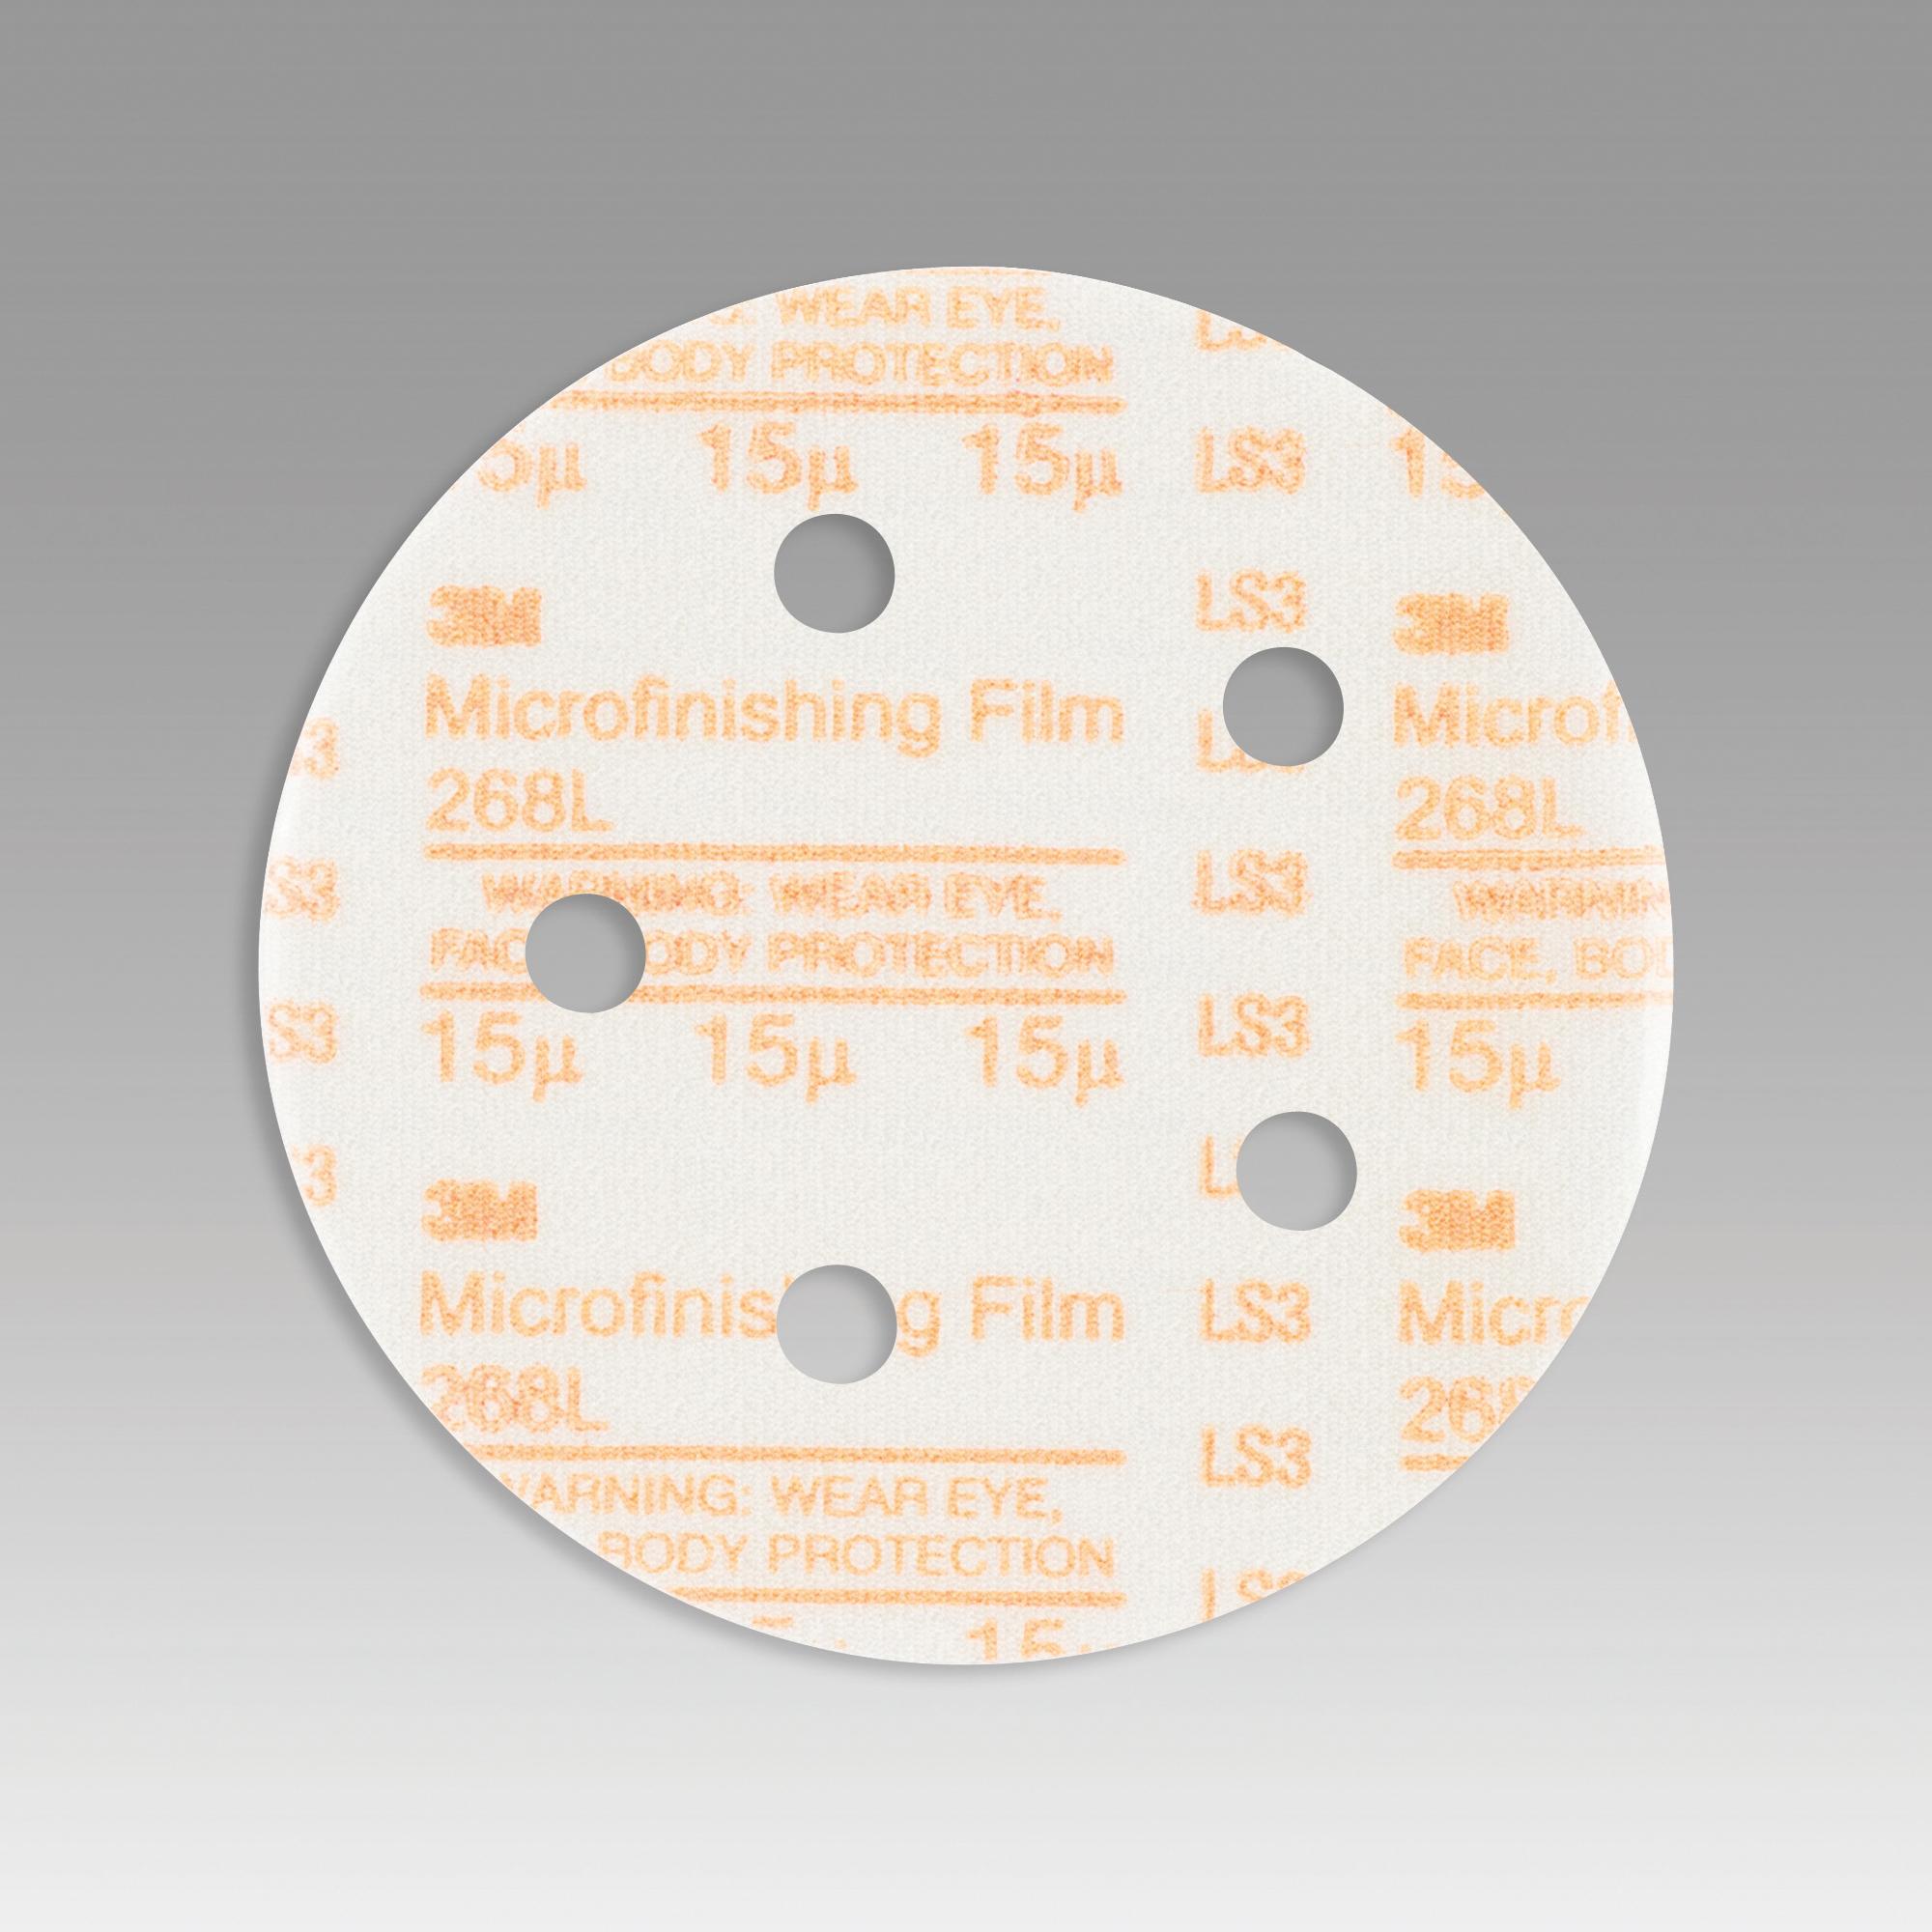 3M™ Hookit™ 051111-54539 268L Type D Microfinishing Orbital Sanding Disc, 5 in Dia Disc, 15 micron Grit, Super Fine Grade, Aluminum Oxide Abrasive, Polyester Film Backing